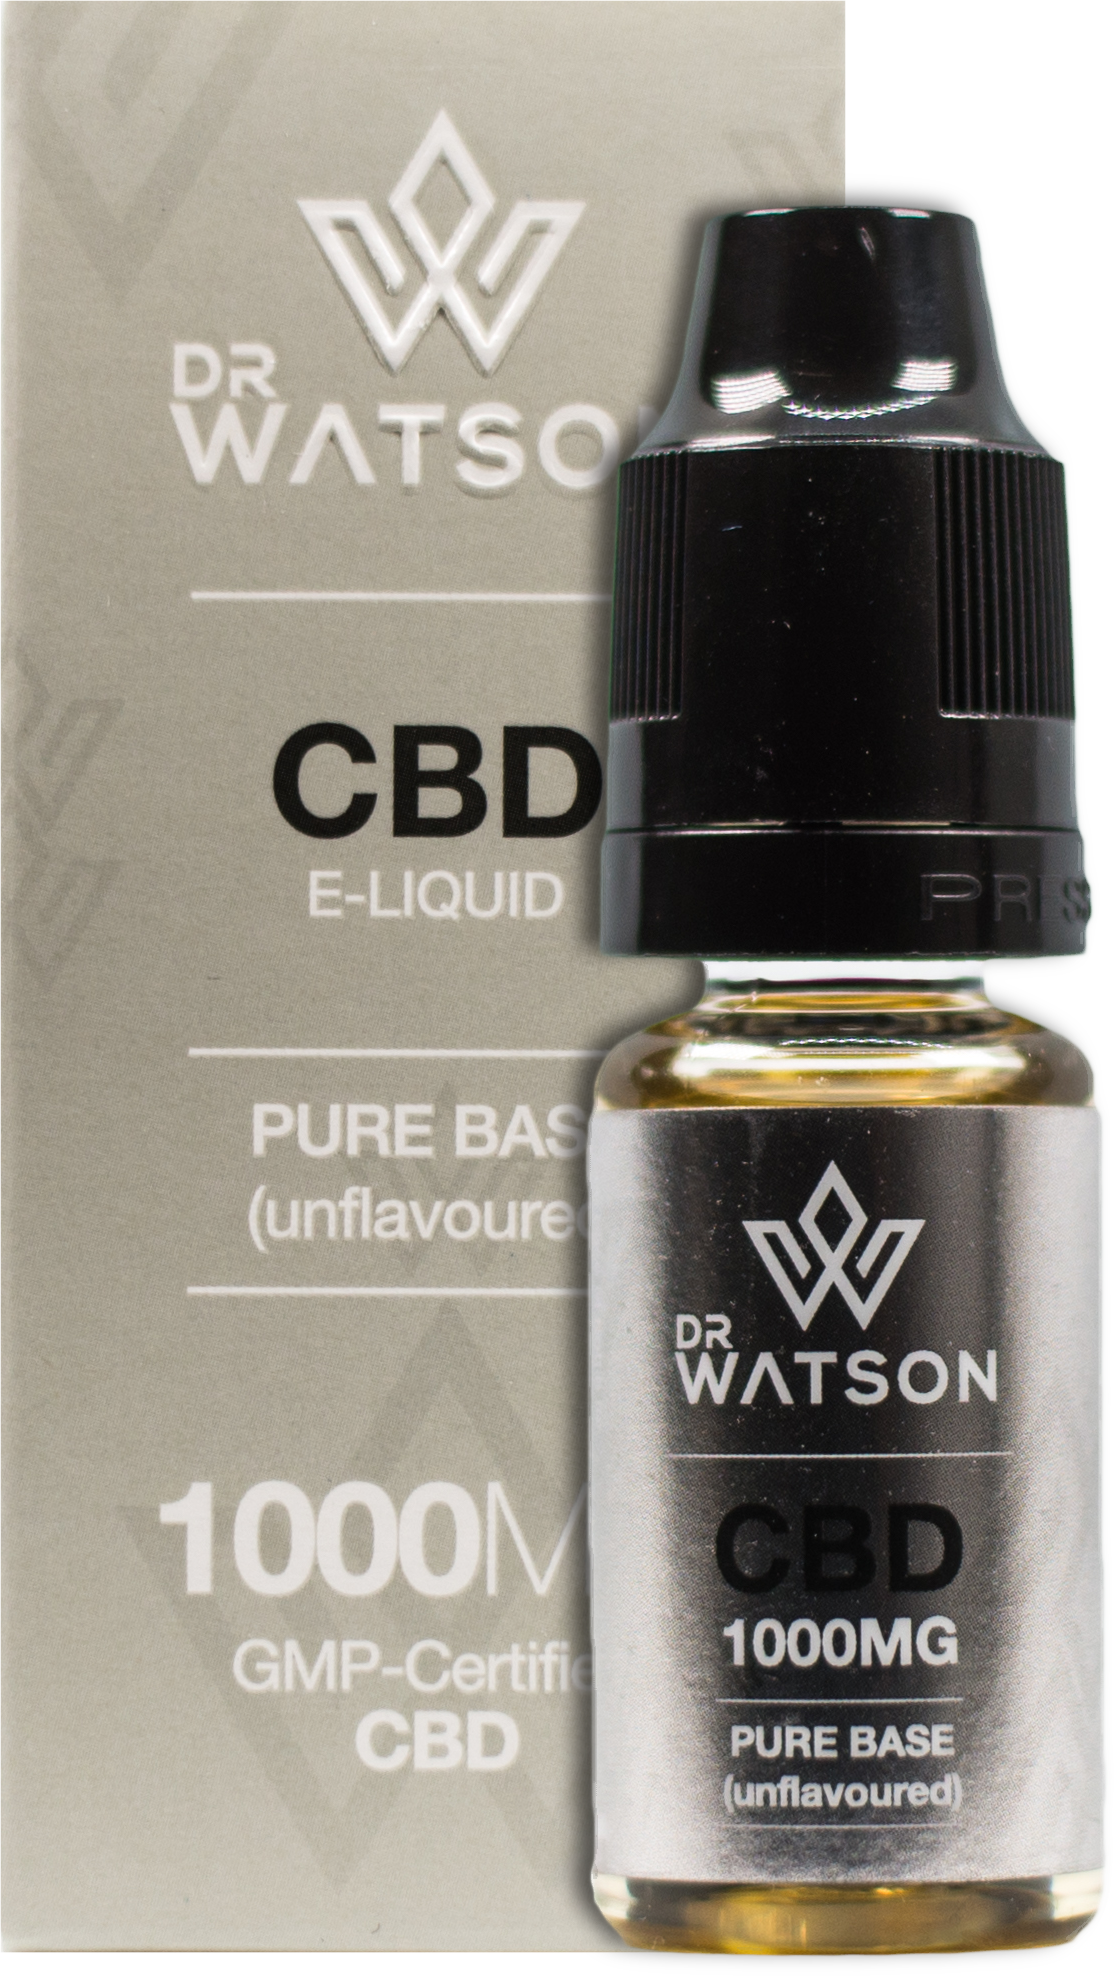 Pure Base - Unflavoured E-Liquids